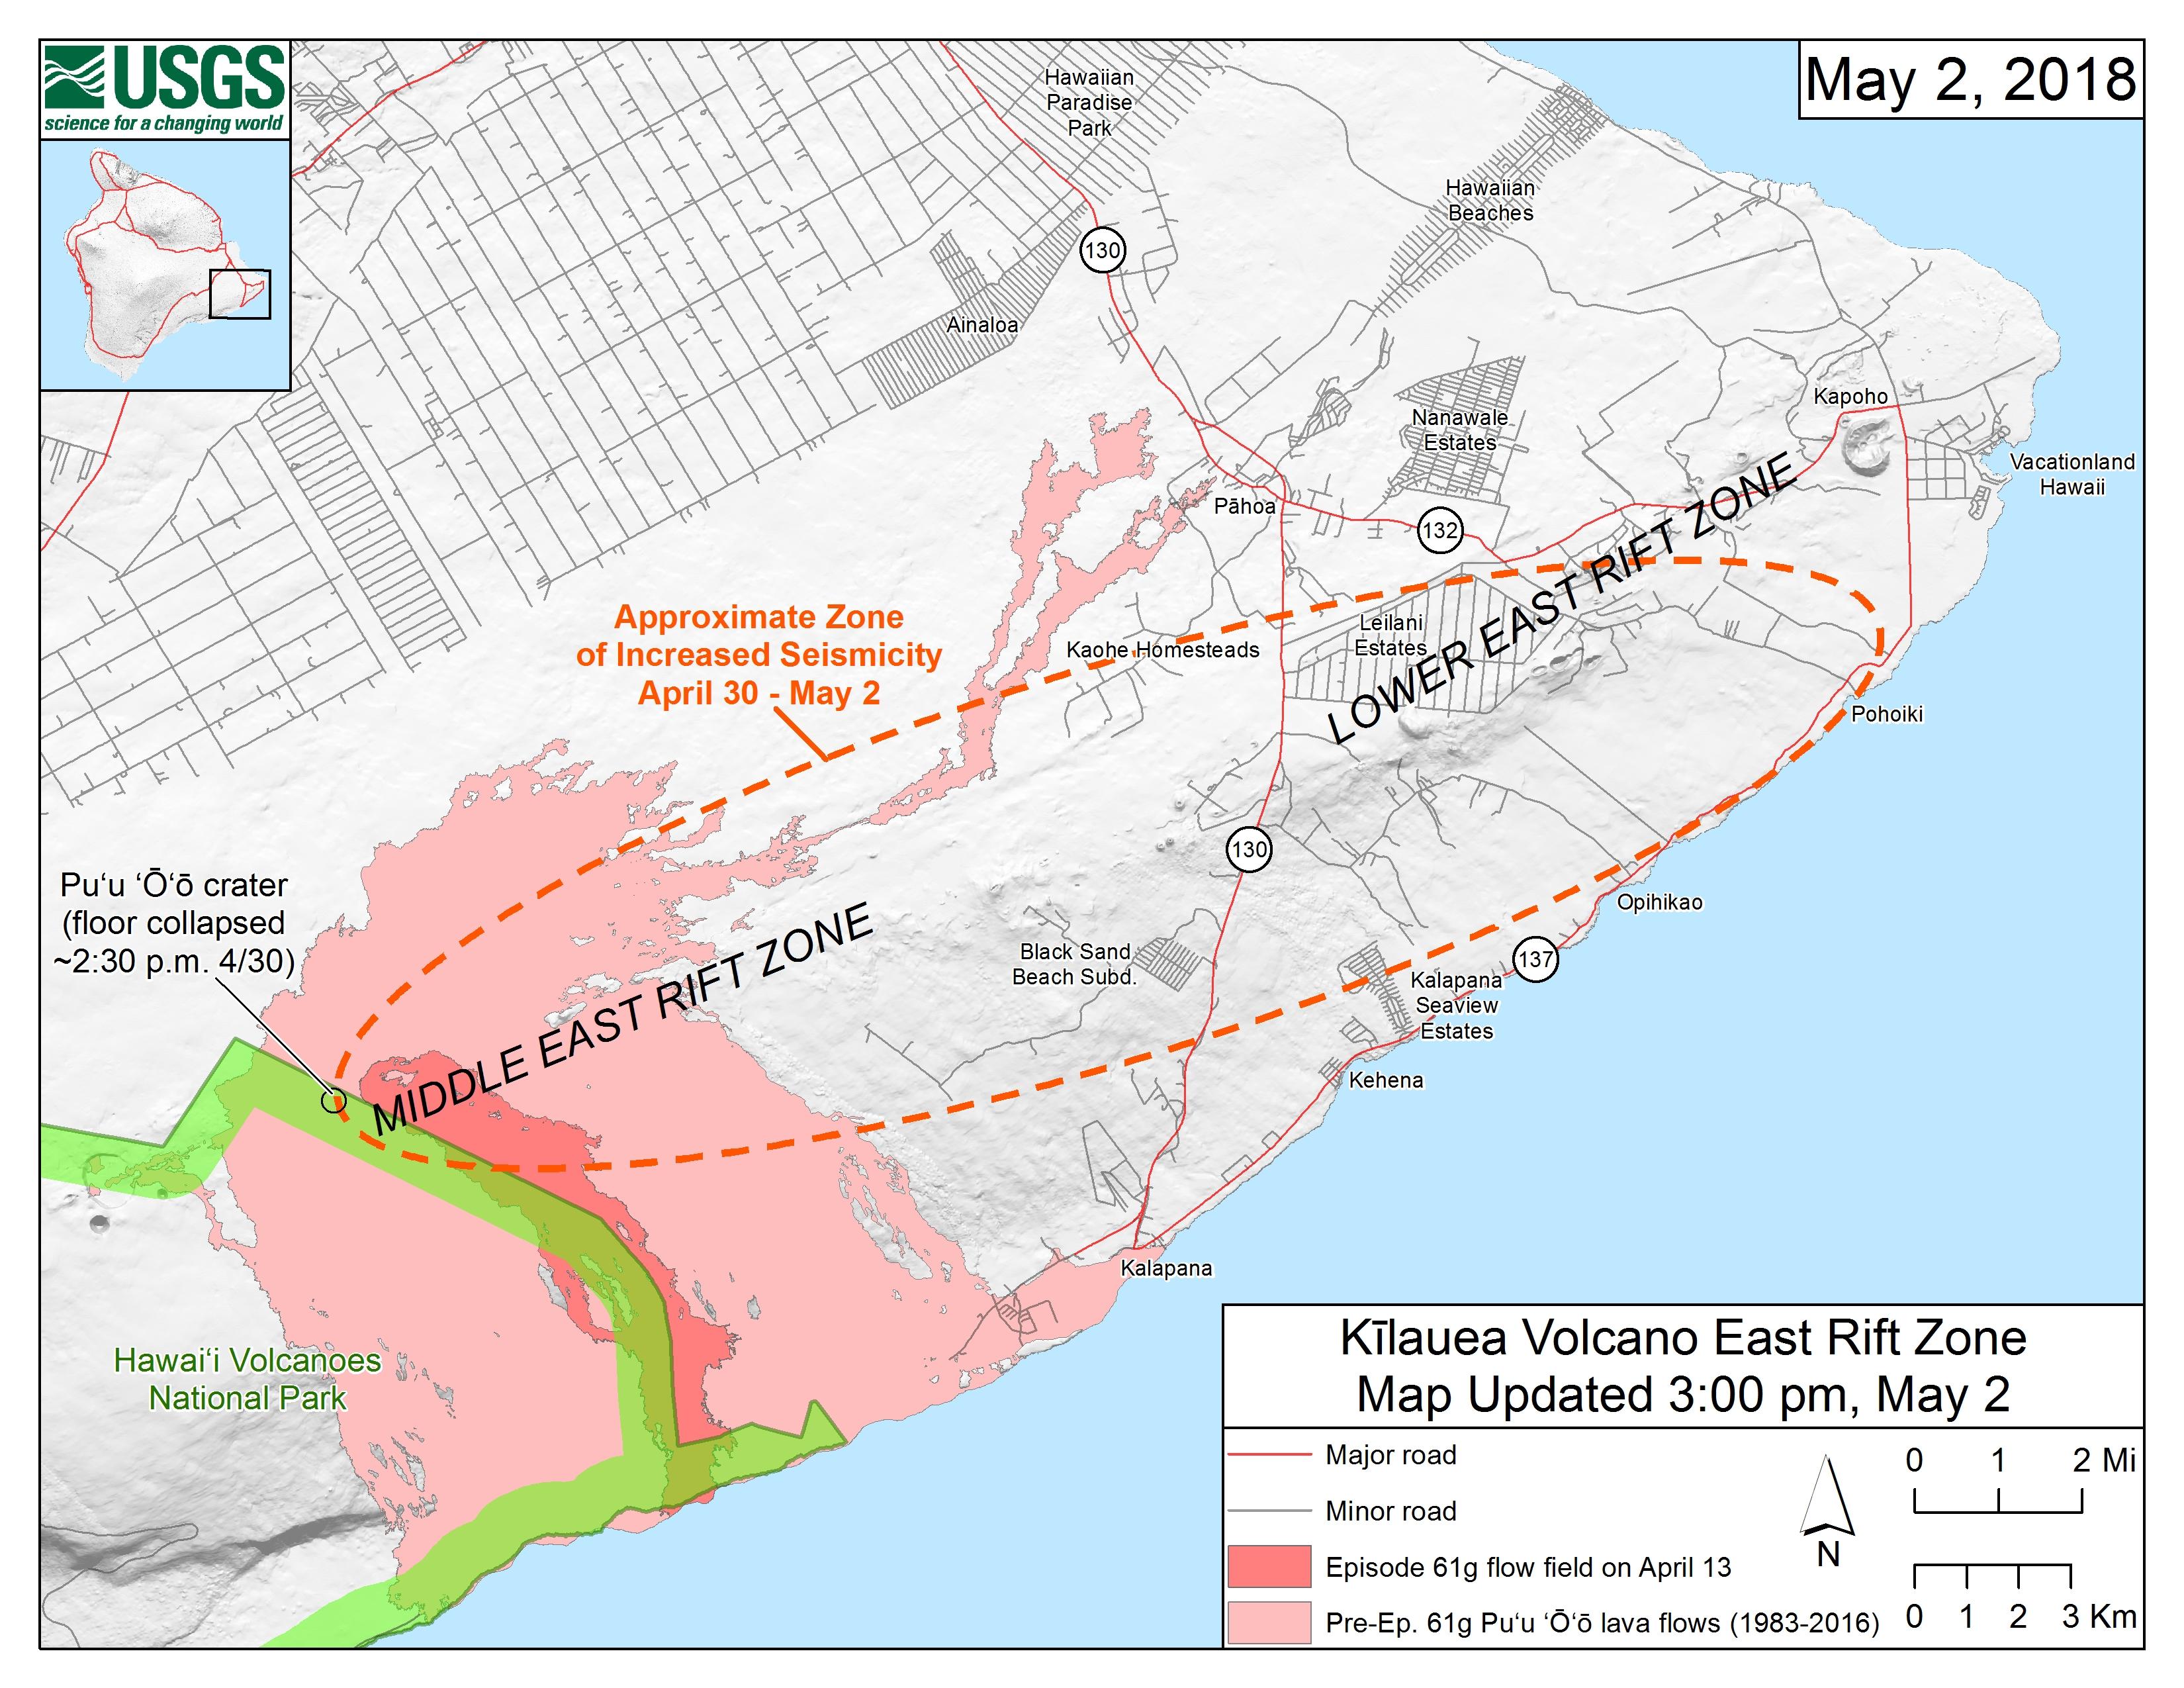 Hawai\'i Volcano: New Map of East Rift Zone | Big Island Now